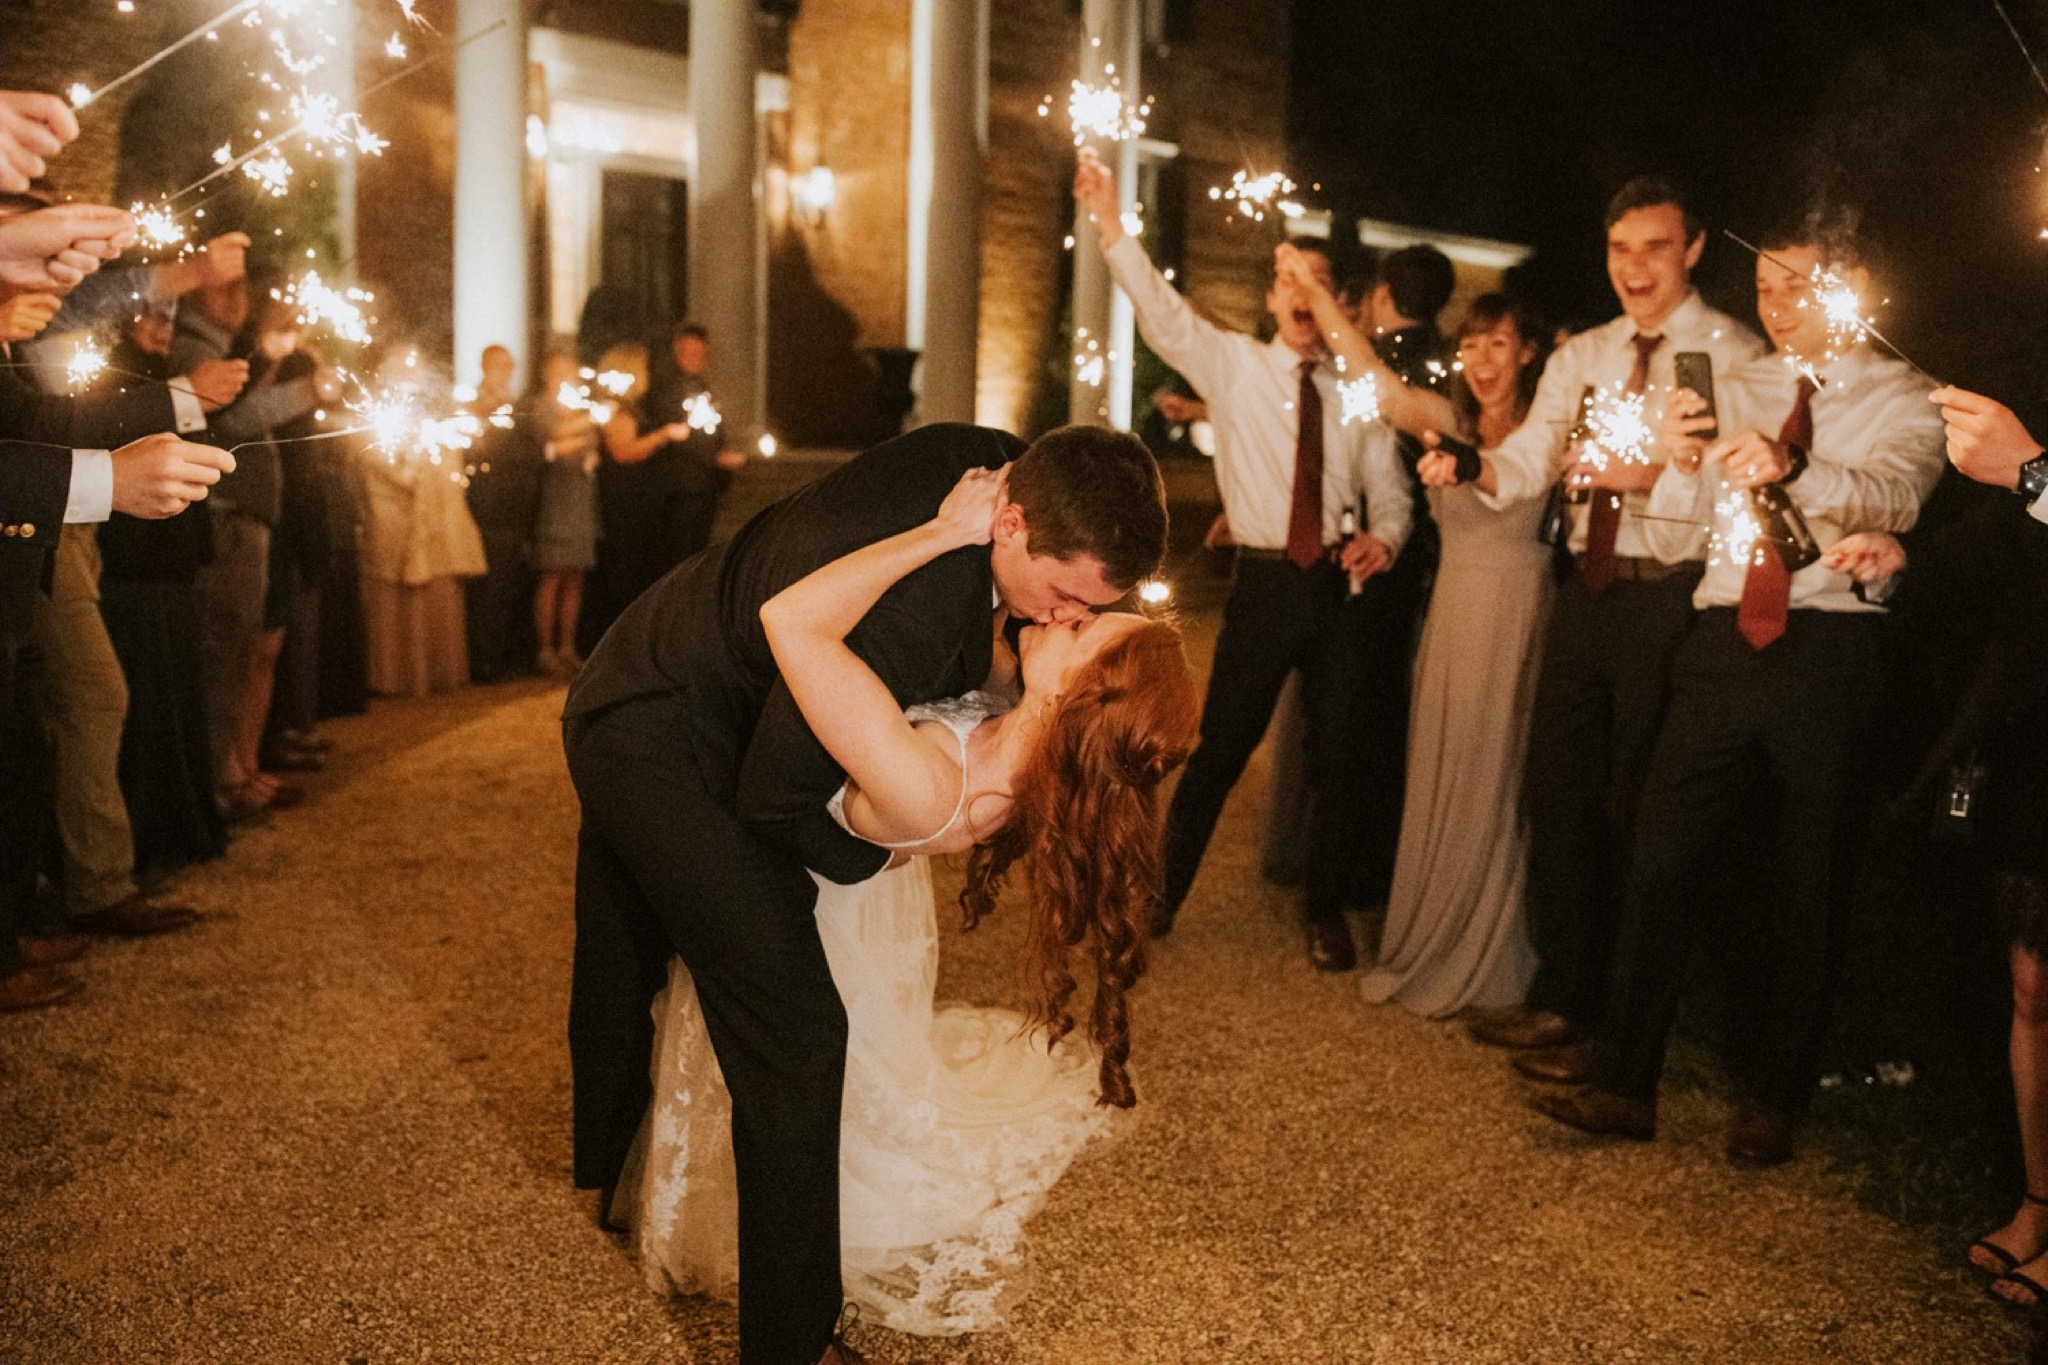 93_West Manor Estate Weddings - Pat Cori Photography-220_Sparklerexit_VirginiaWeddingPhotographer_WestManorEstate_Weddingvenue_Virginia.jpg